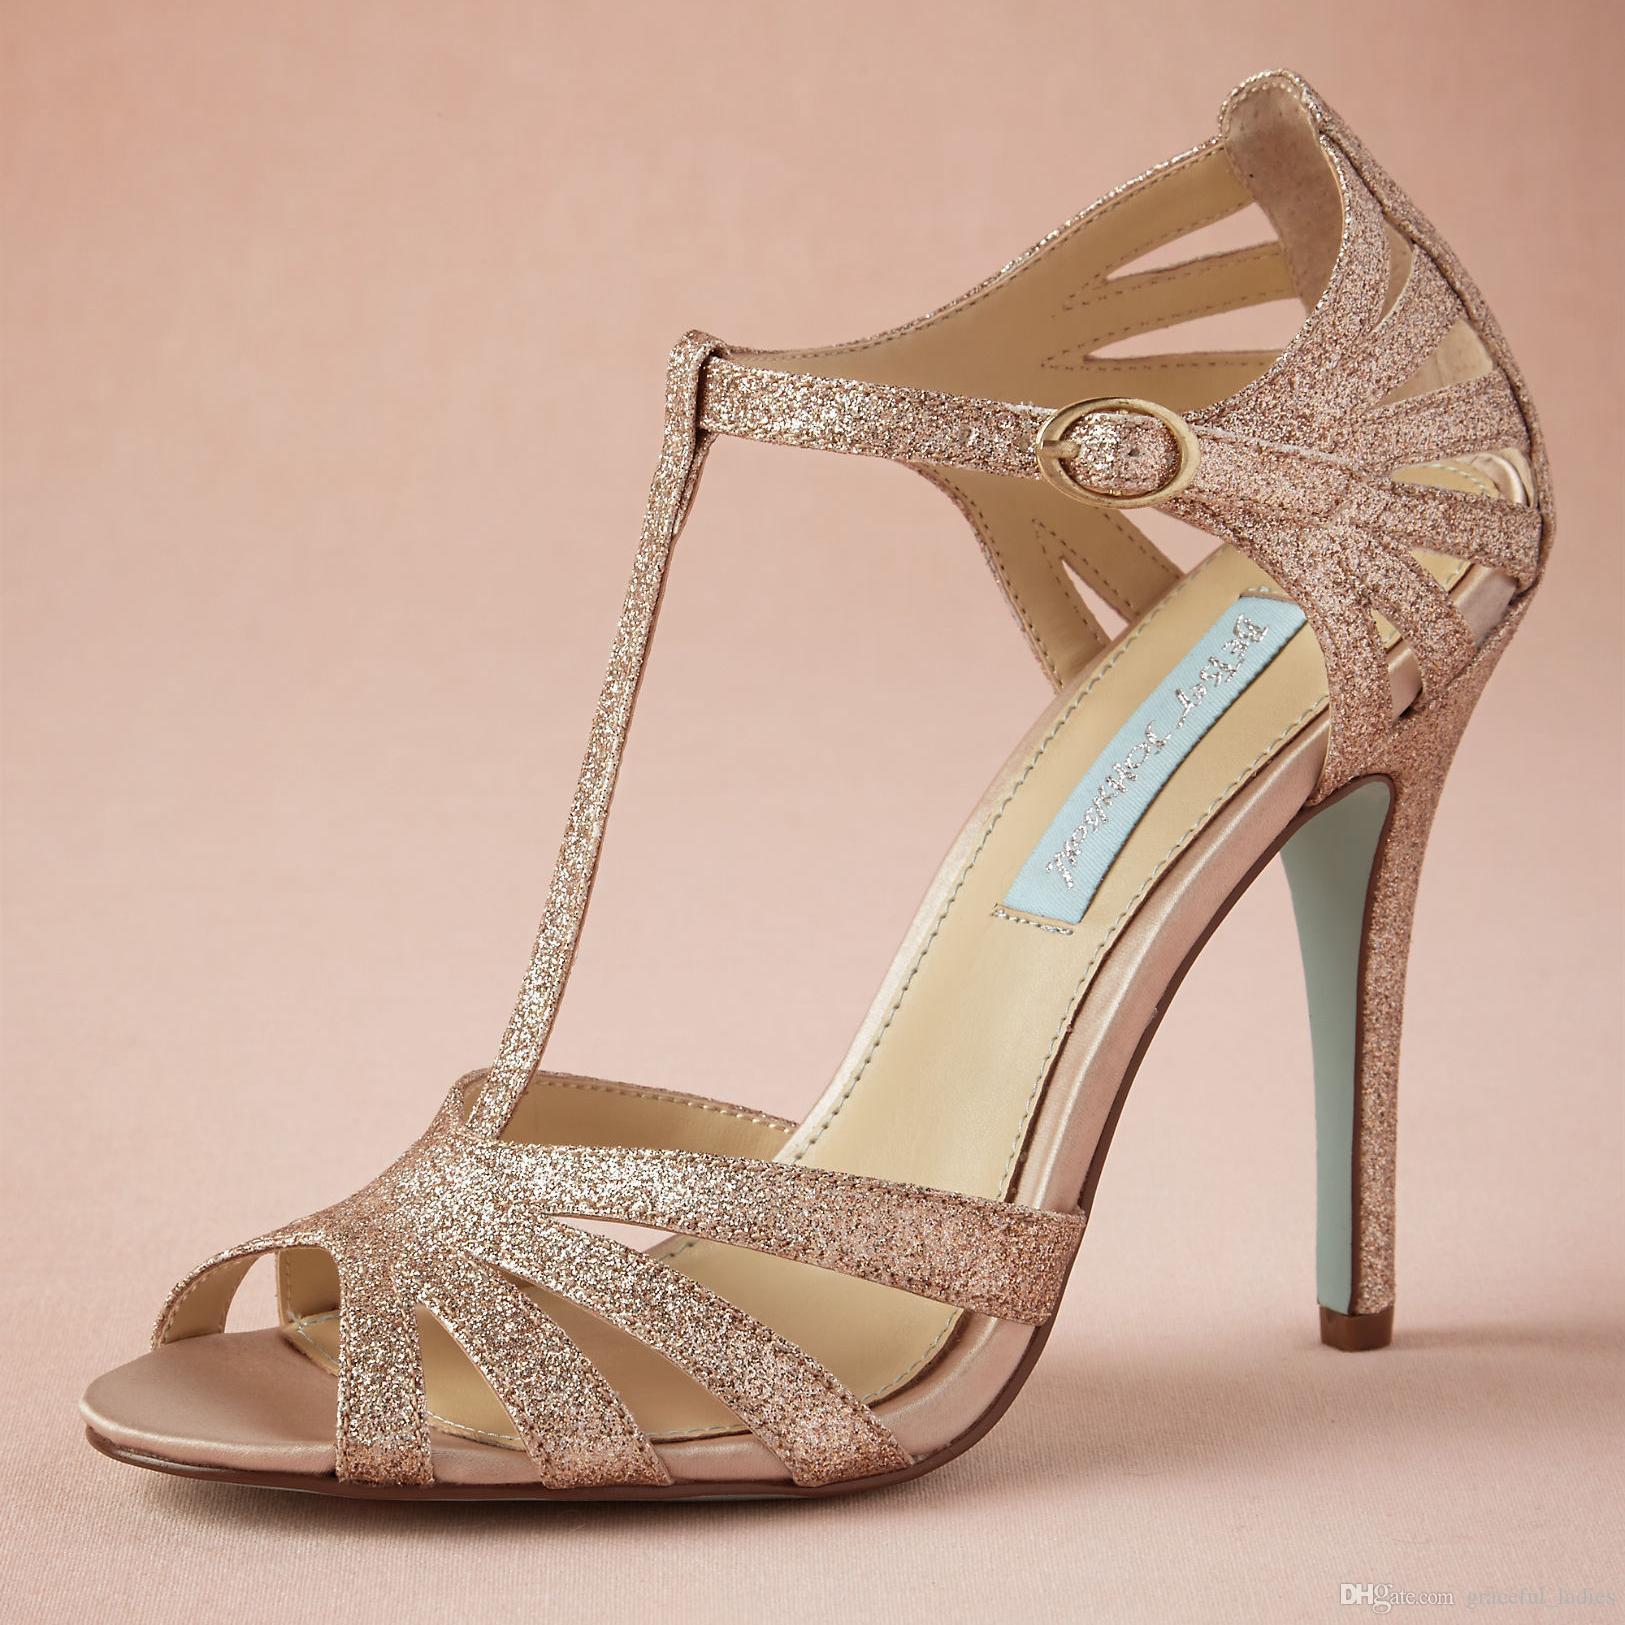 6ff7dc37138 Wedding shoes 3.5 inch heel - Florida-Photo-Magazine.com